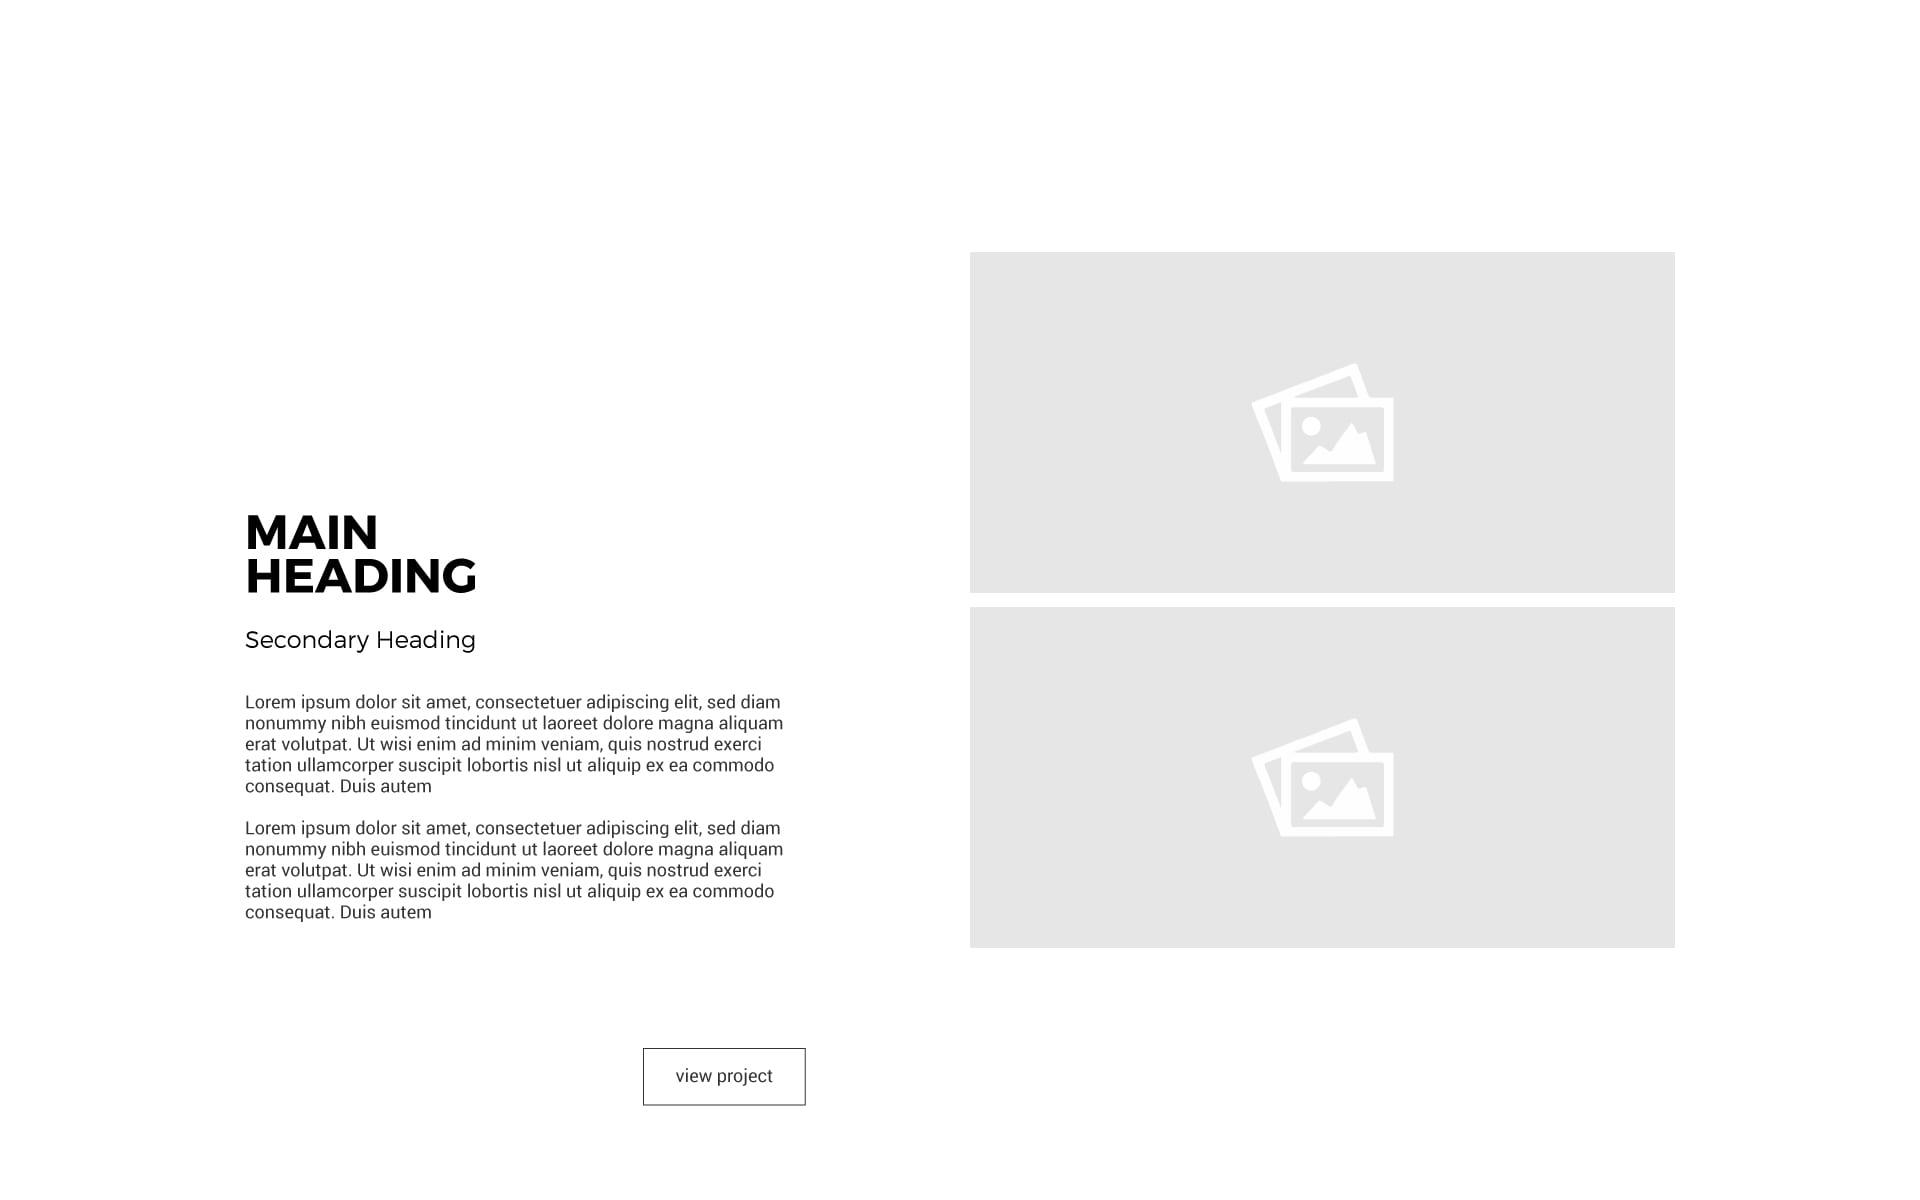 adobe illustrator how to save as pdf